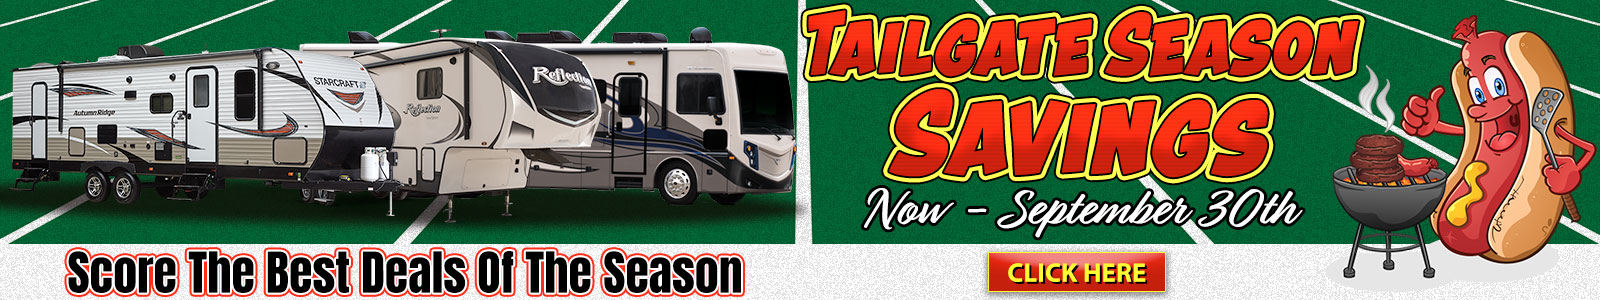 RV Sale September Tailgate RV Season Brown's RV Superstore